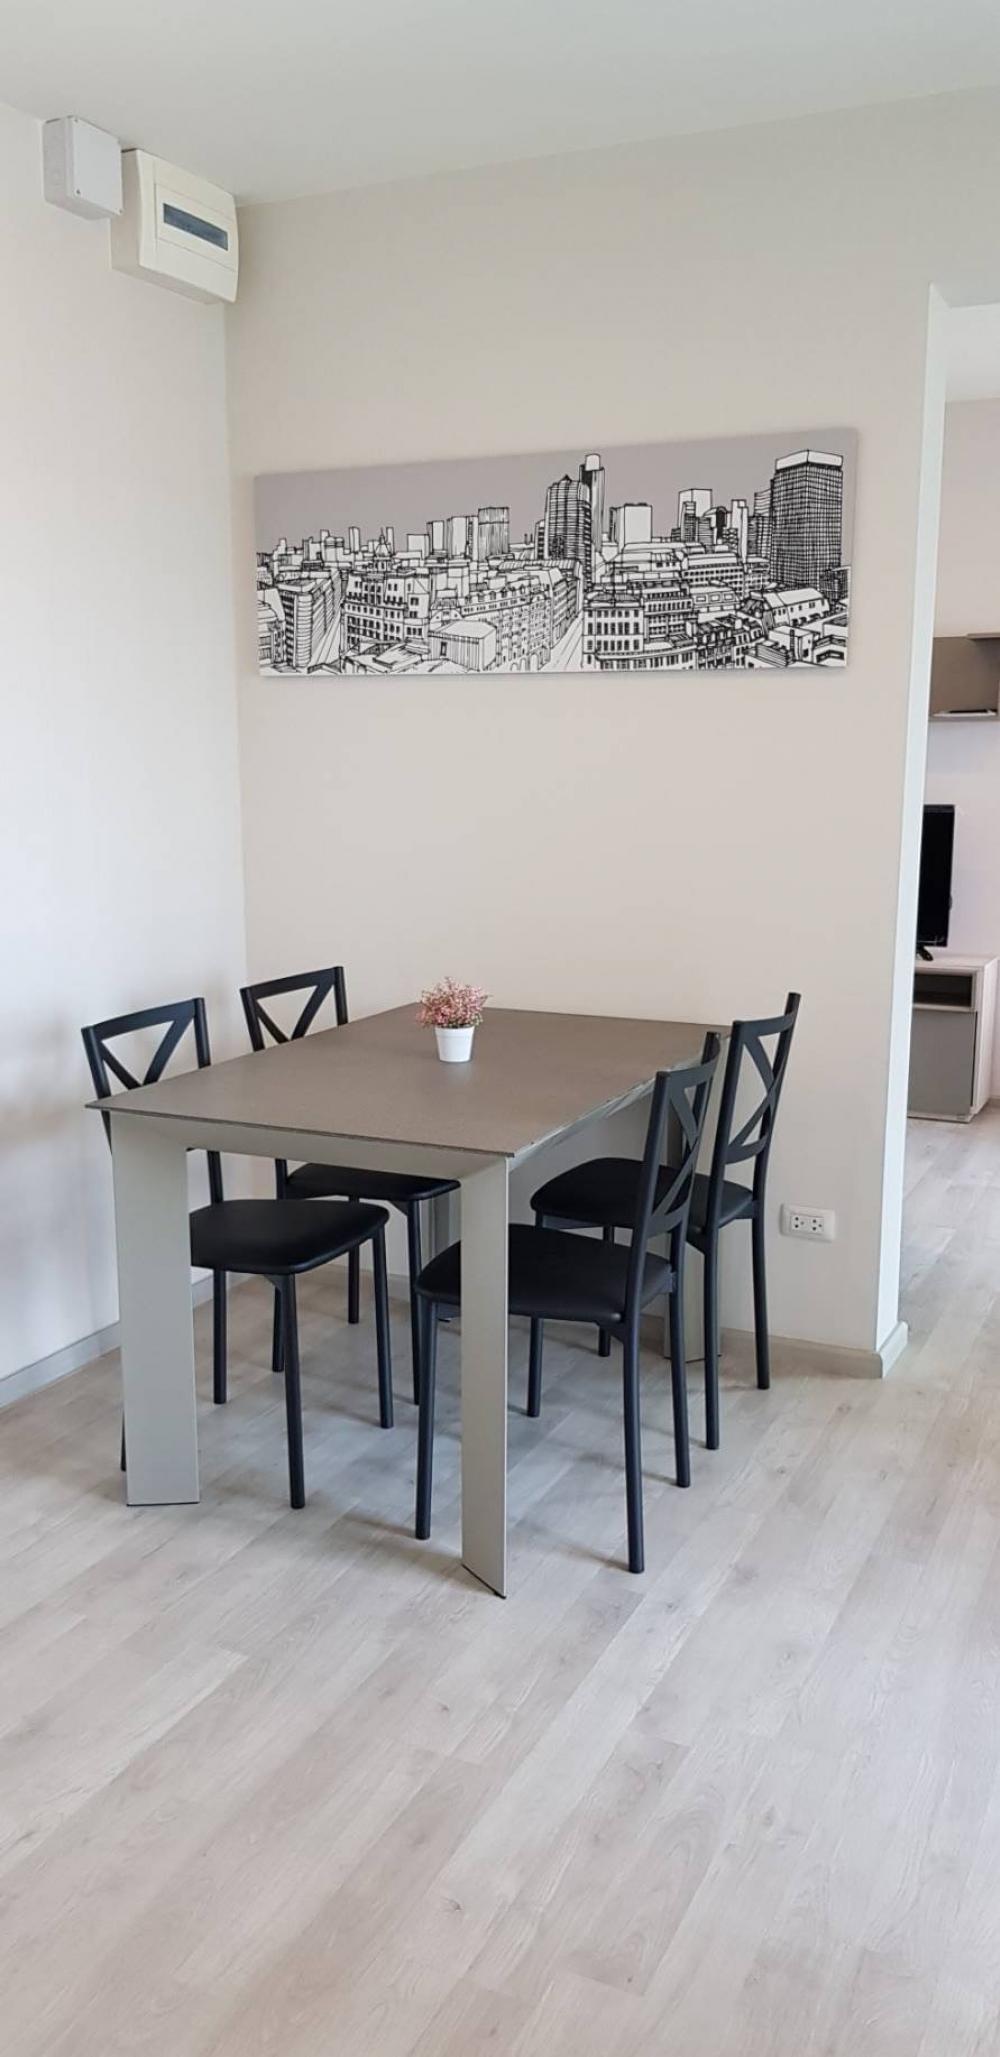 For RentCondoRattanathibet, Sanambinna : For rent, Plum Central Westgate 2 bedrooms, price 12,000 / month